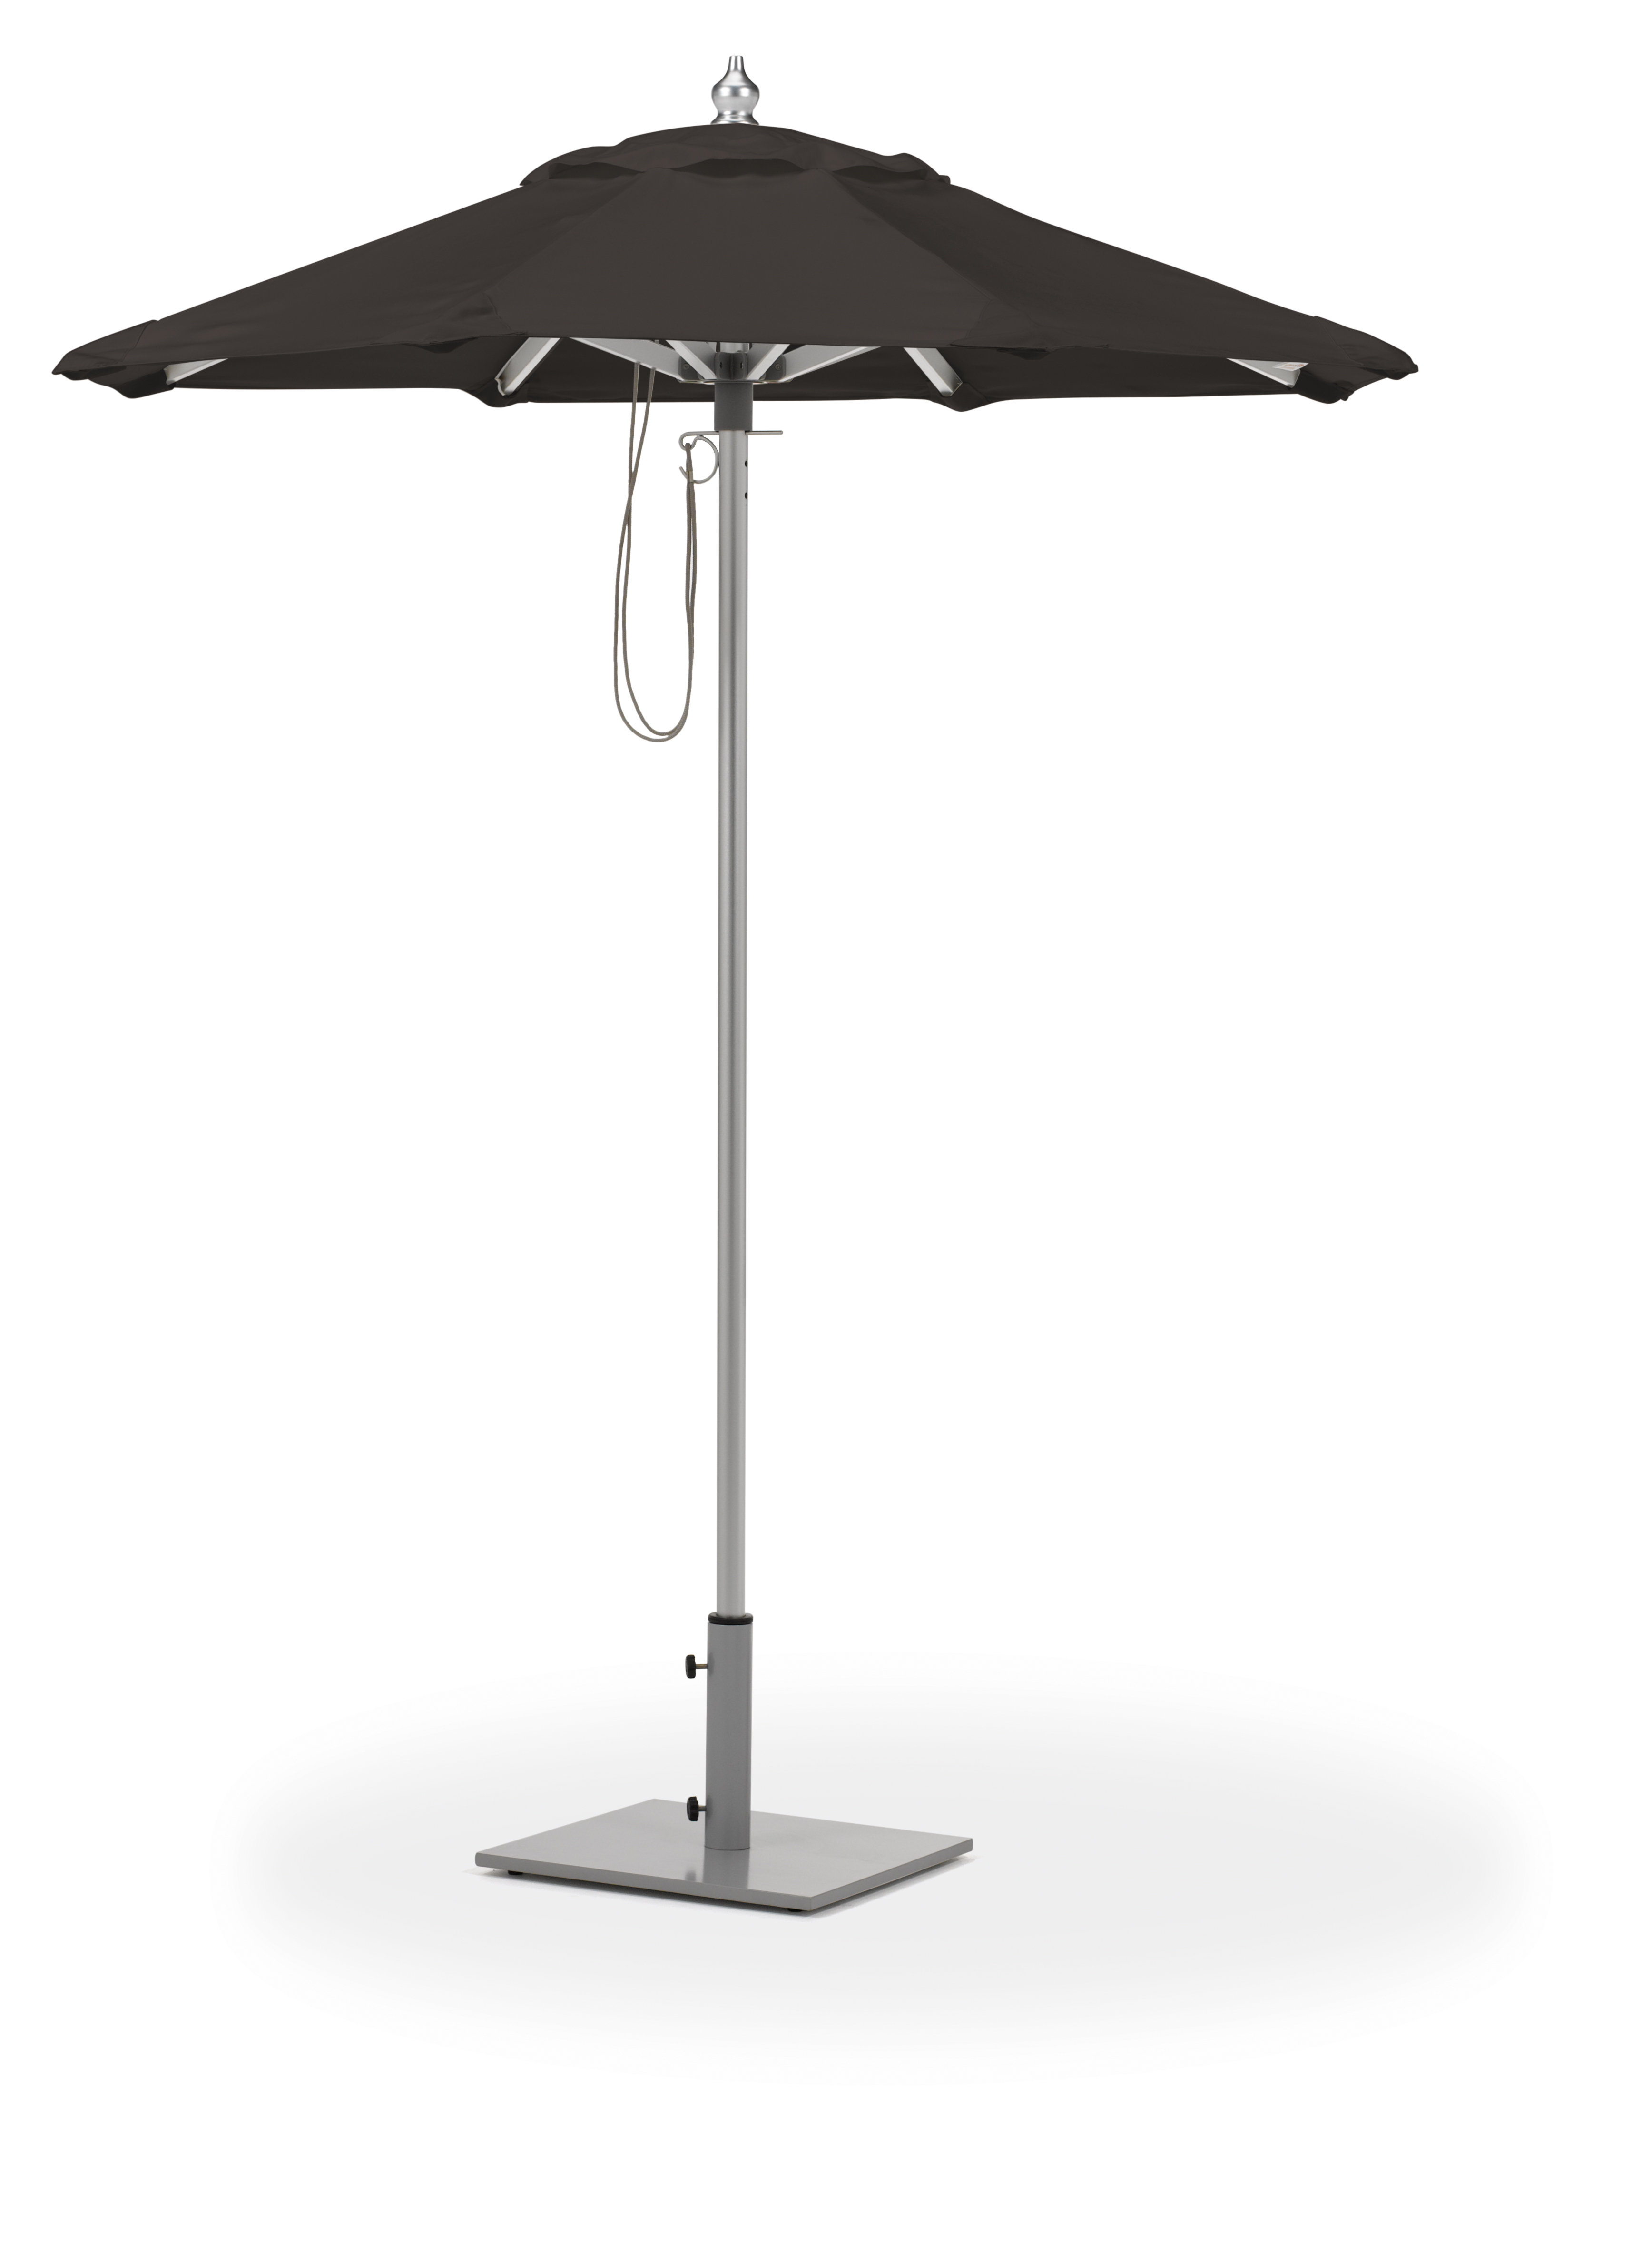 Most Popular Crowborough Market Umbrellas Intended For Stambaugh 6' Market Umbrella (View 9 of 20)